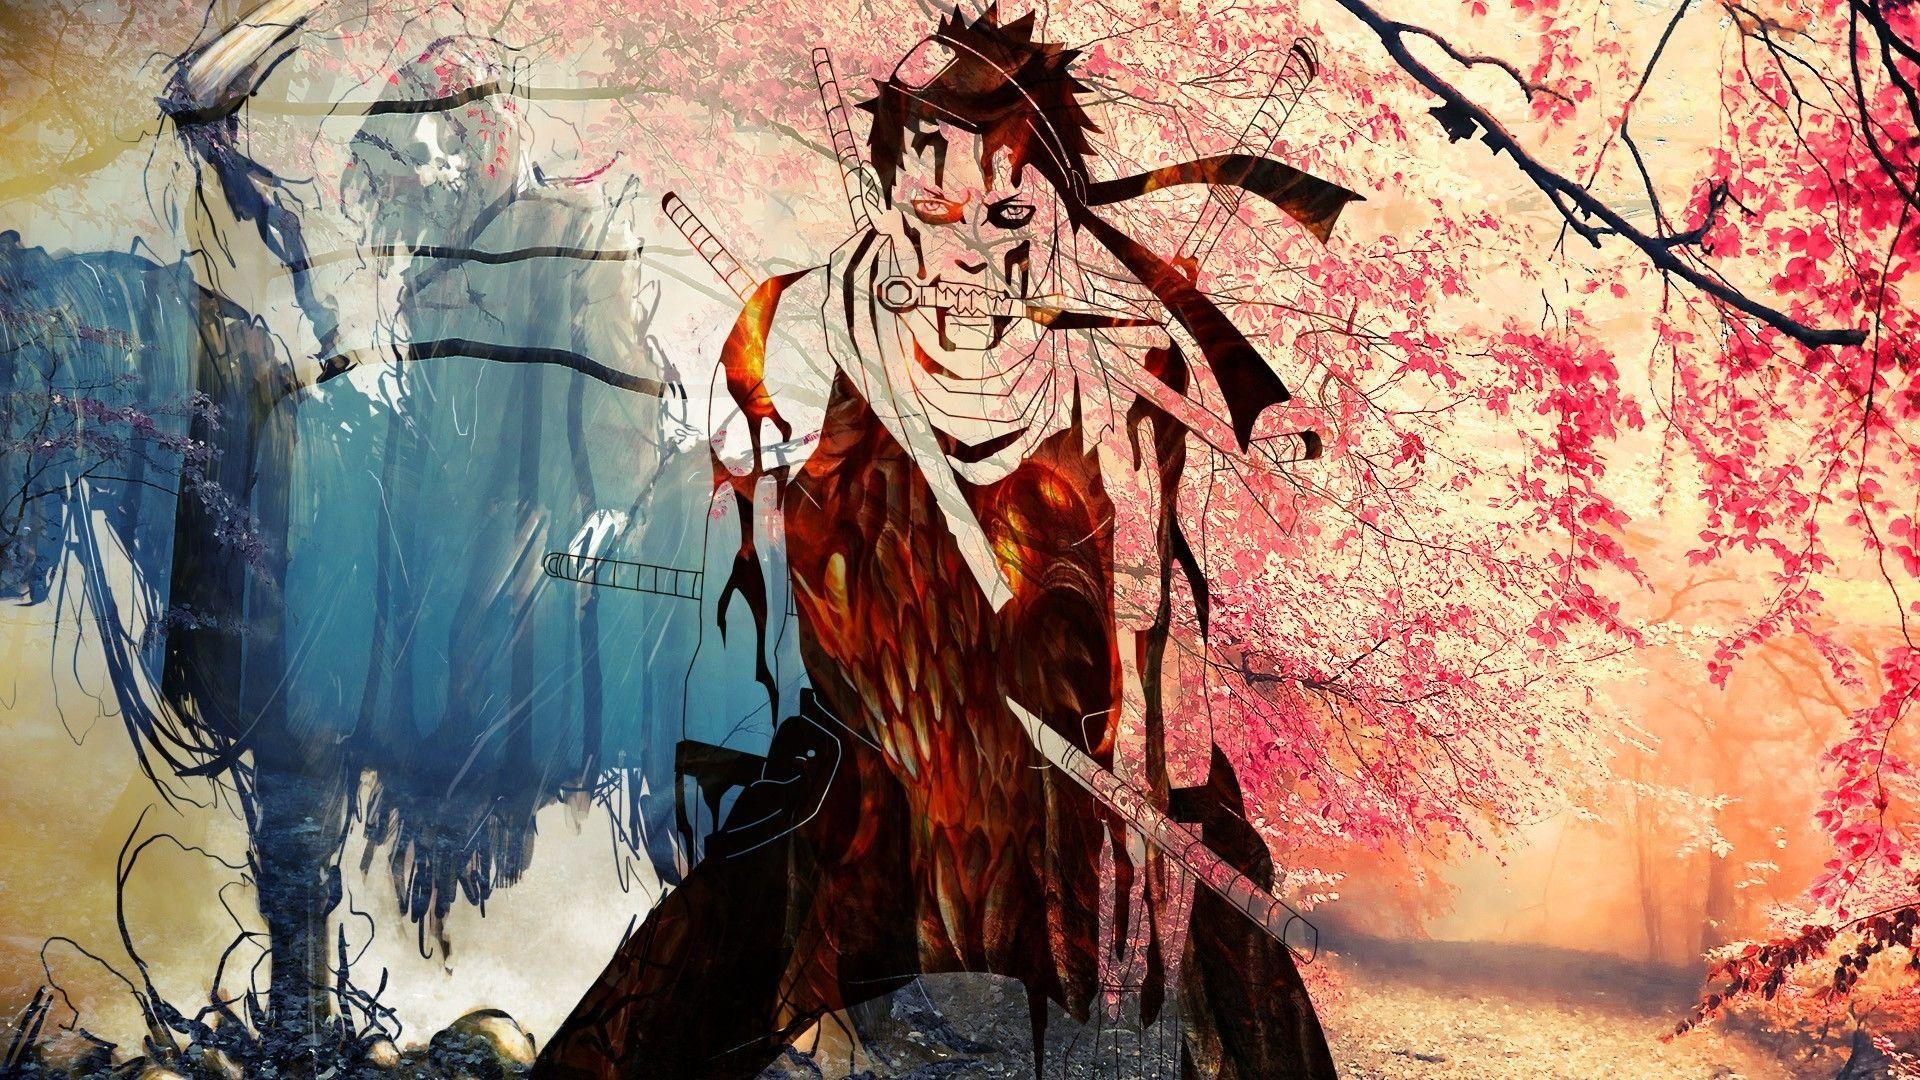 Naruto Hd, Wallpaper Theme